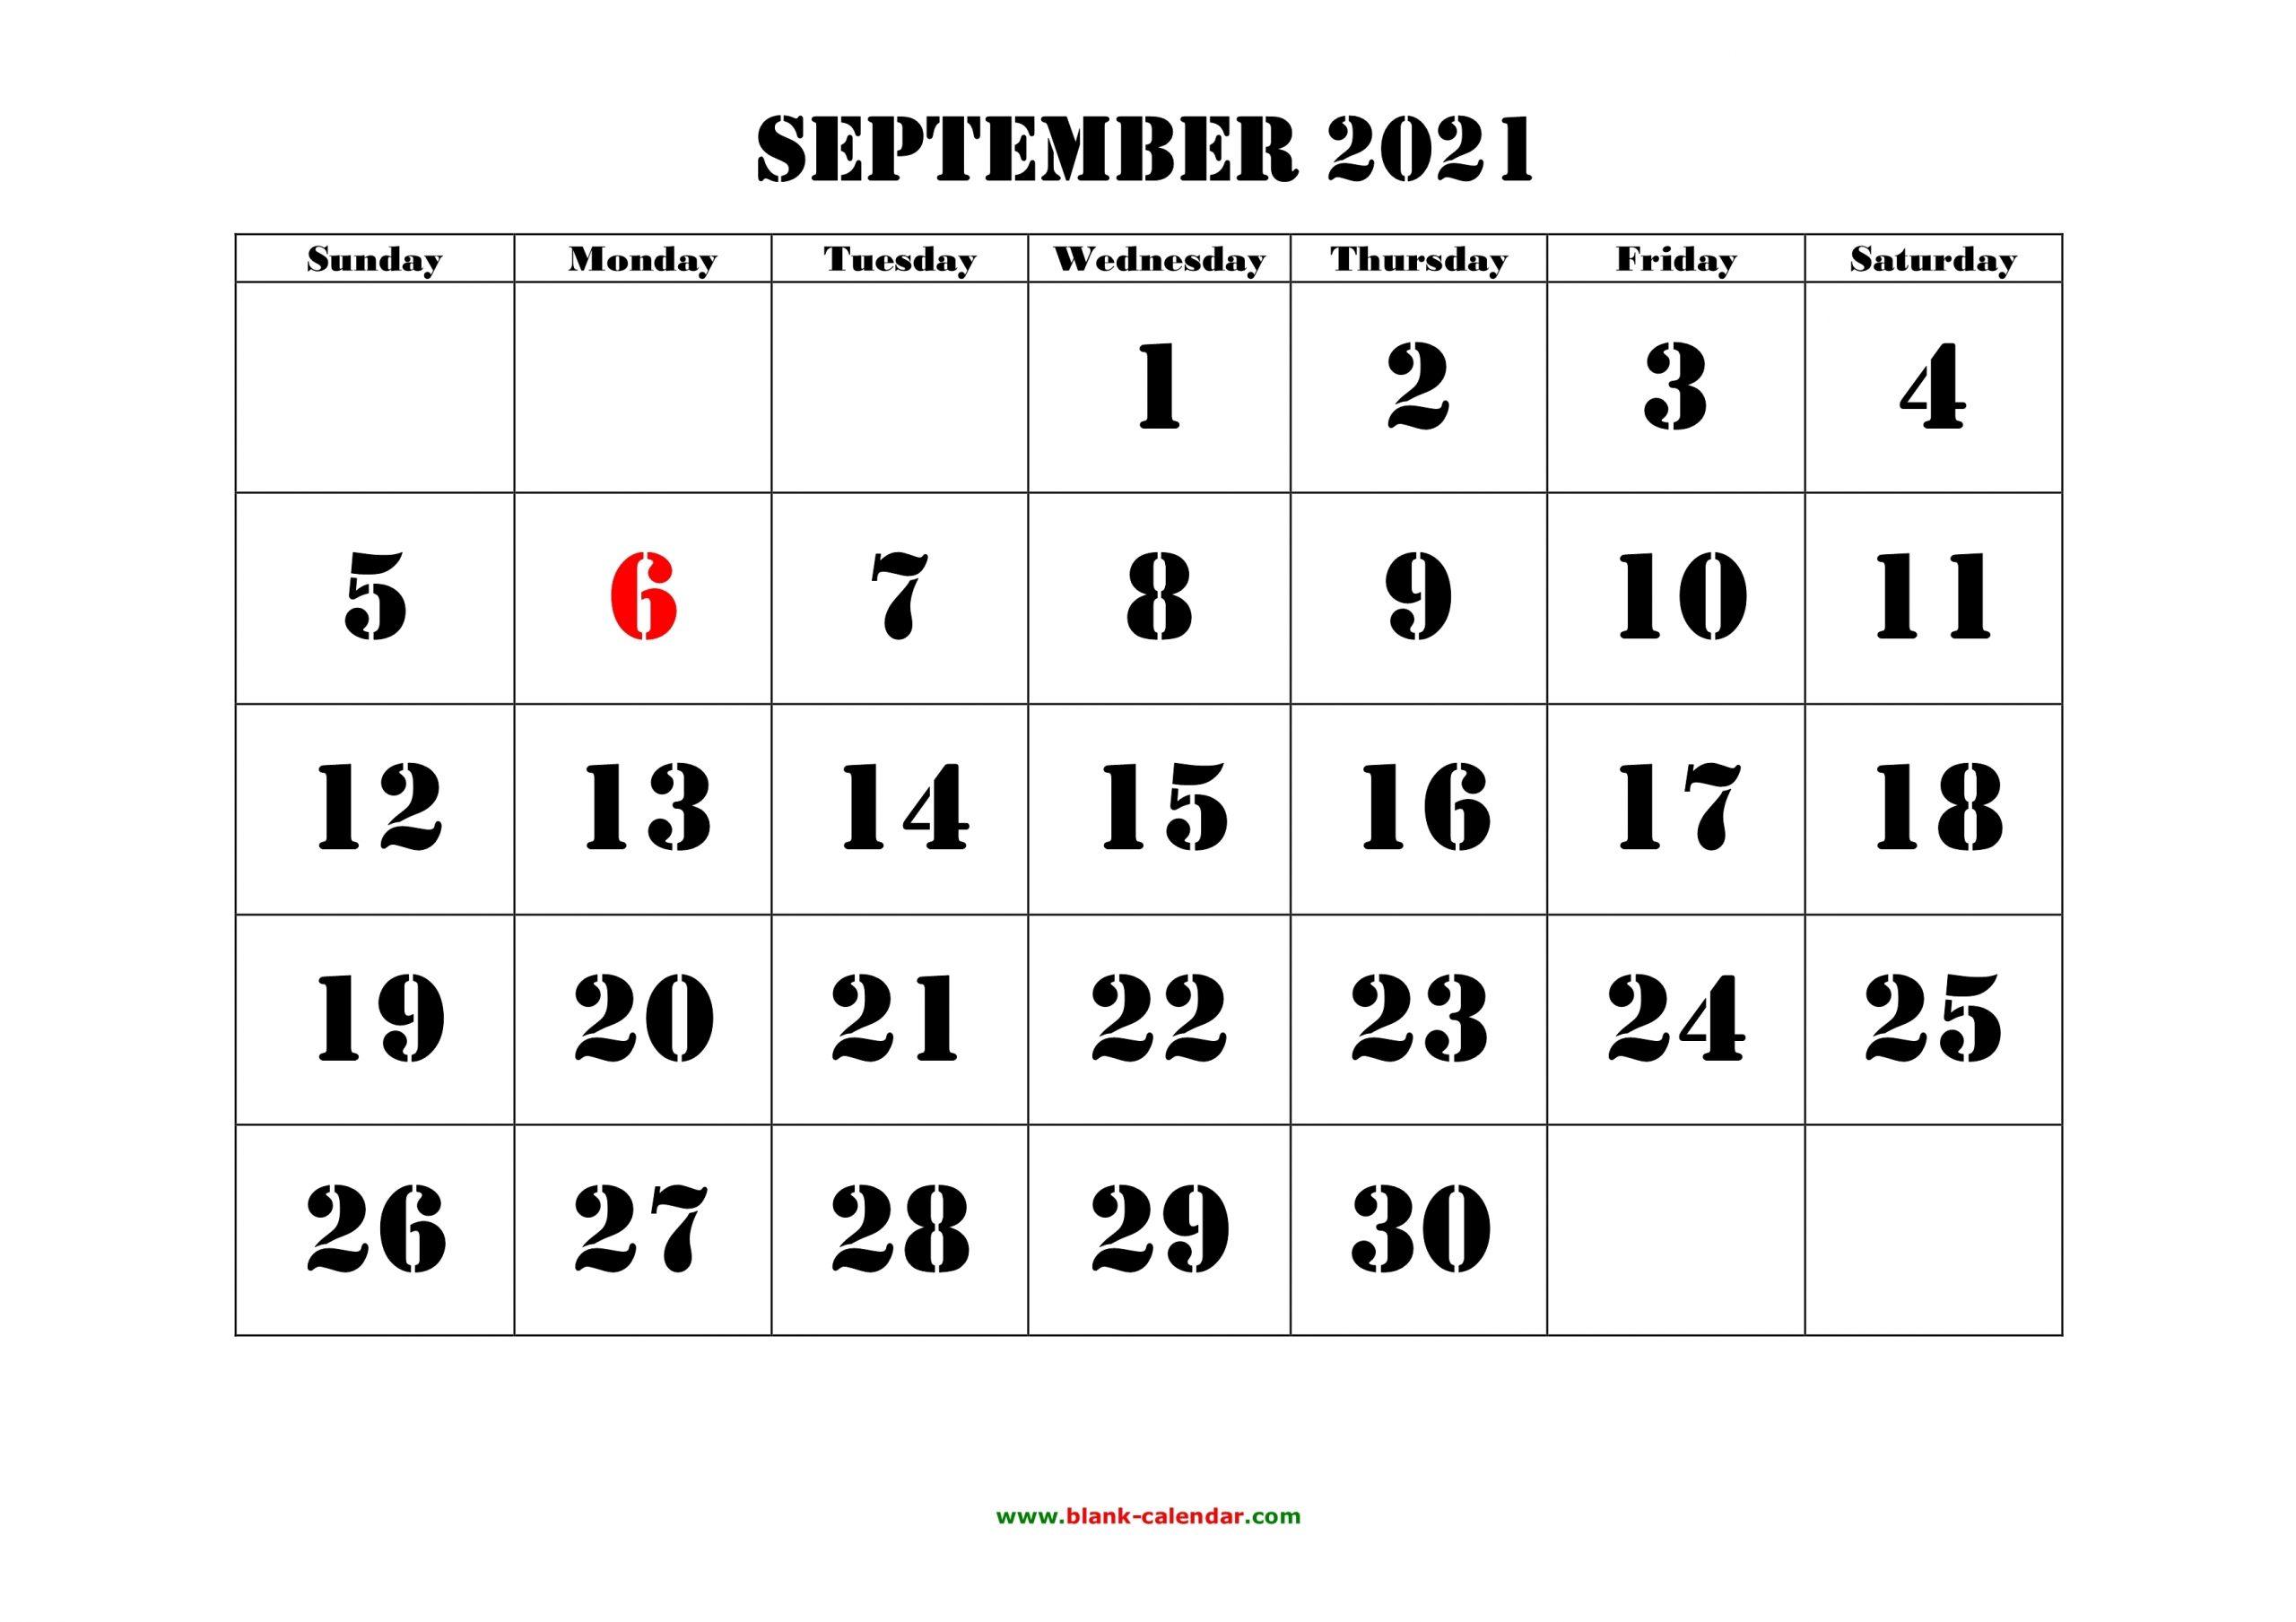 Take September 2021 Calendar Printable Images